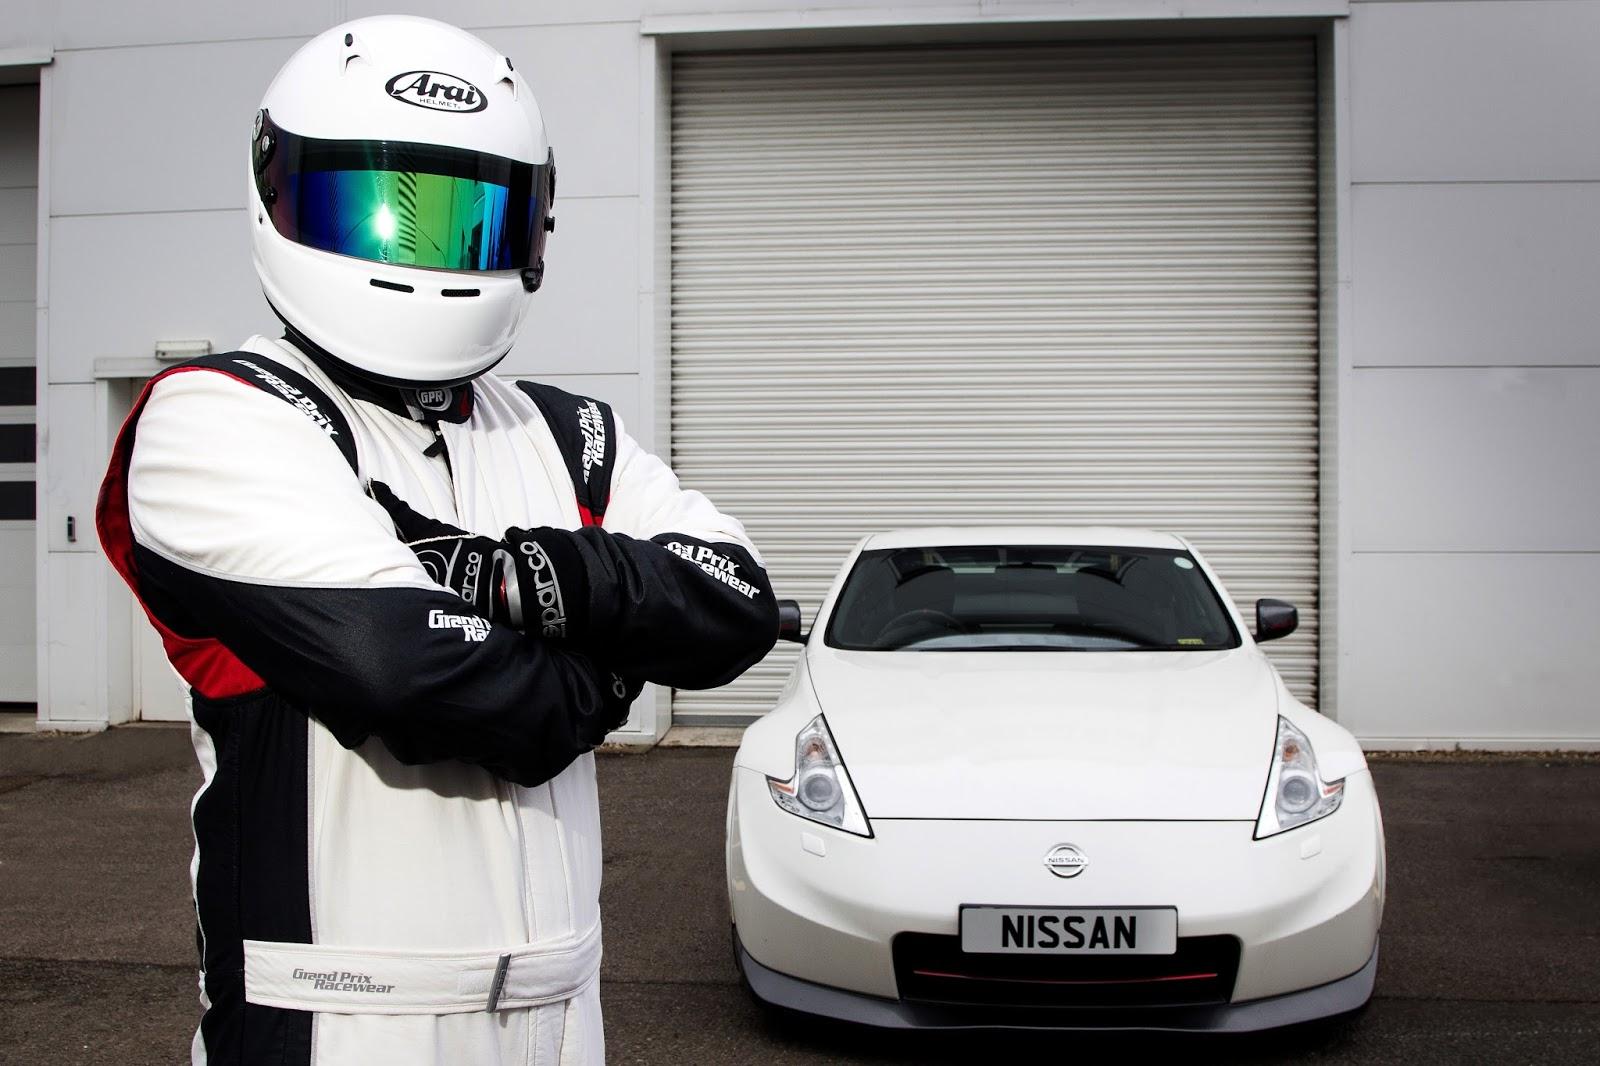 145920 1 5 H Nissan αποκαλύπτει τον δικό της… Stig ! Driver, Fun, Nissan